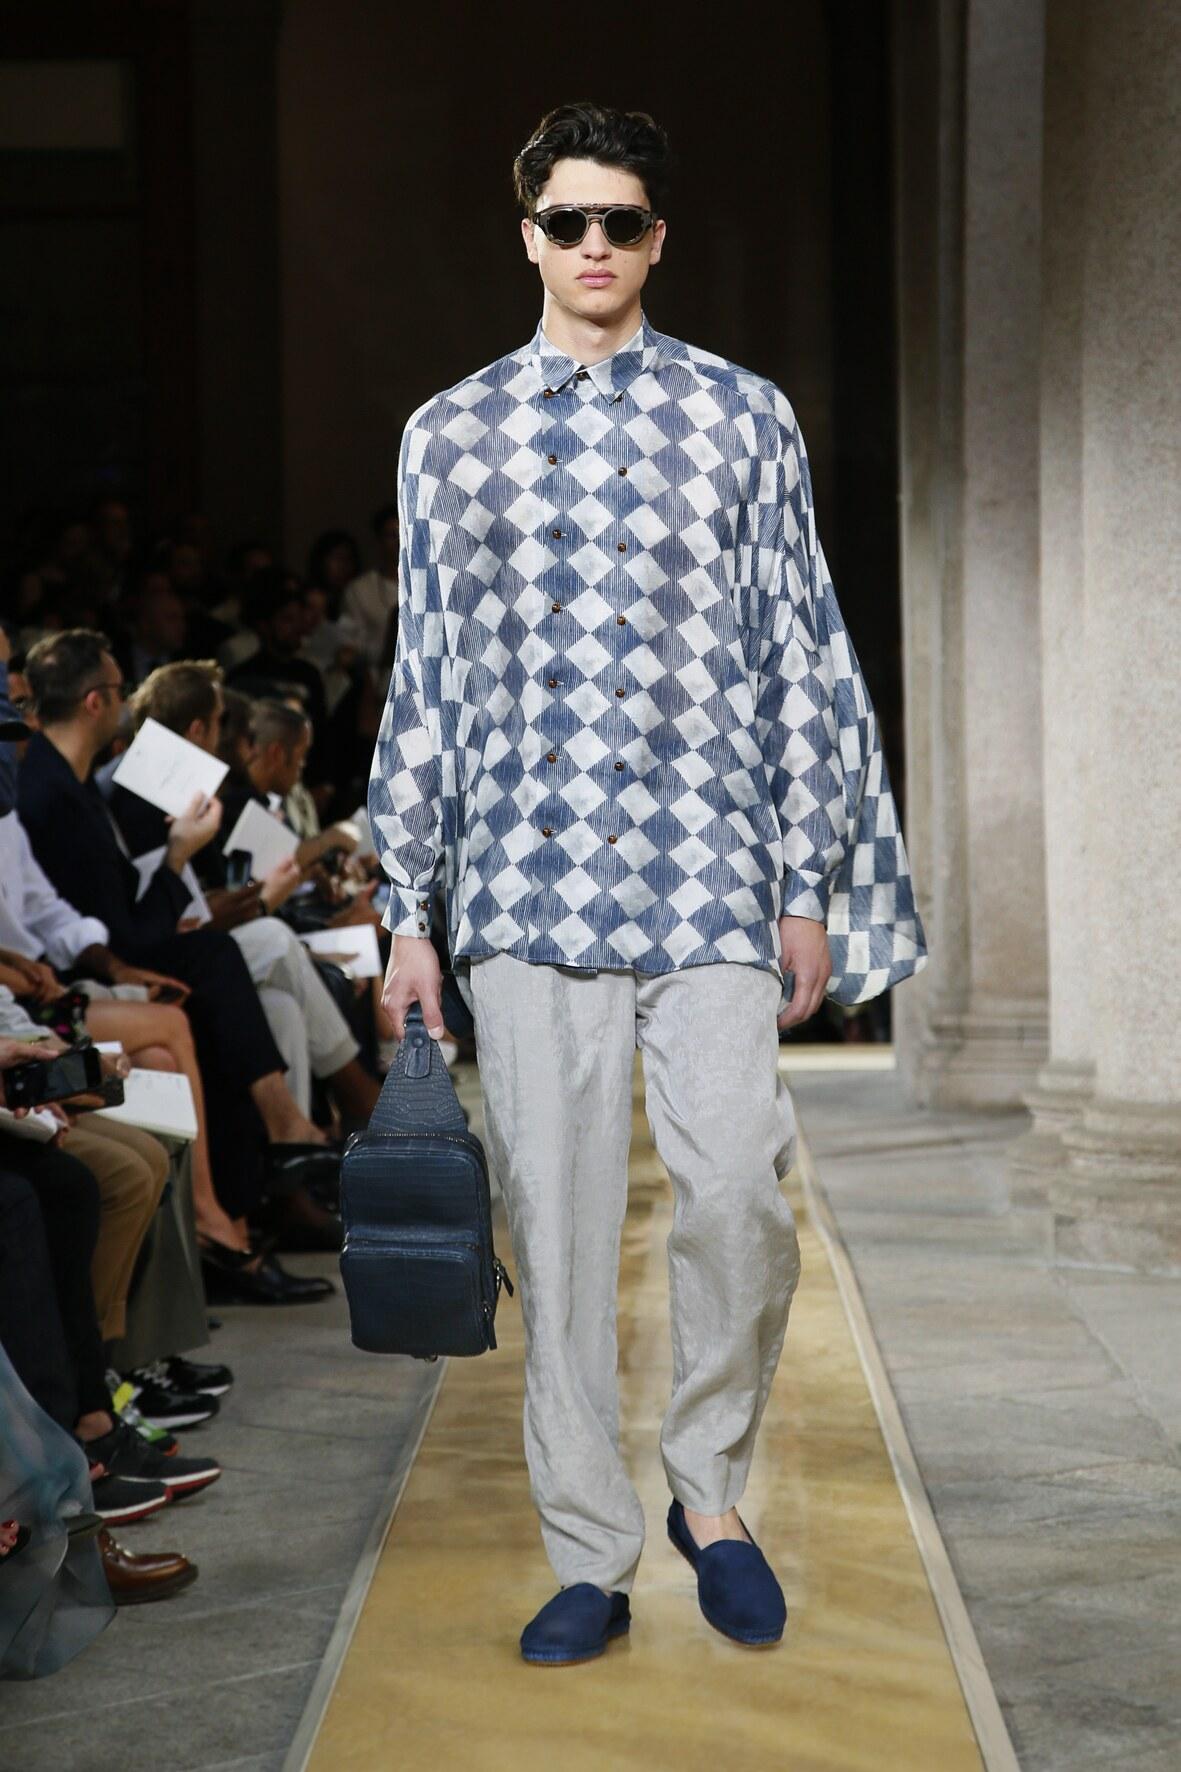 2020 Catwalk Giorgio Armani Summer Man Collection